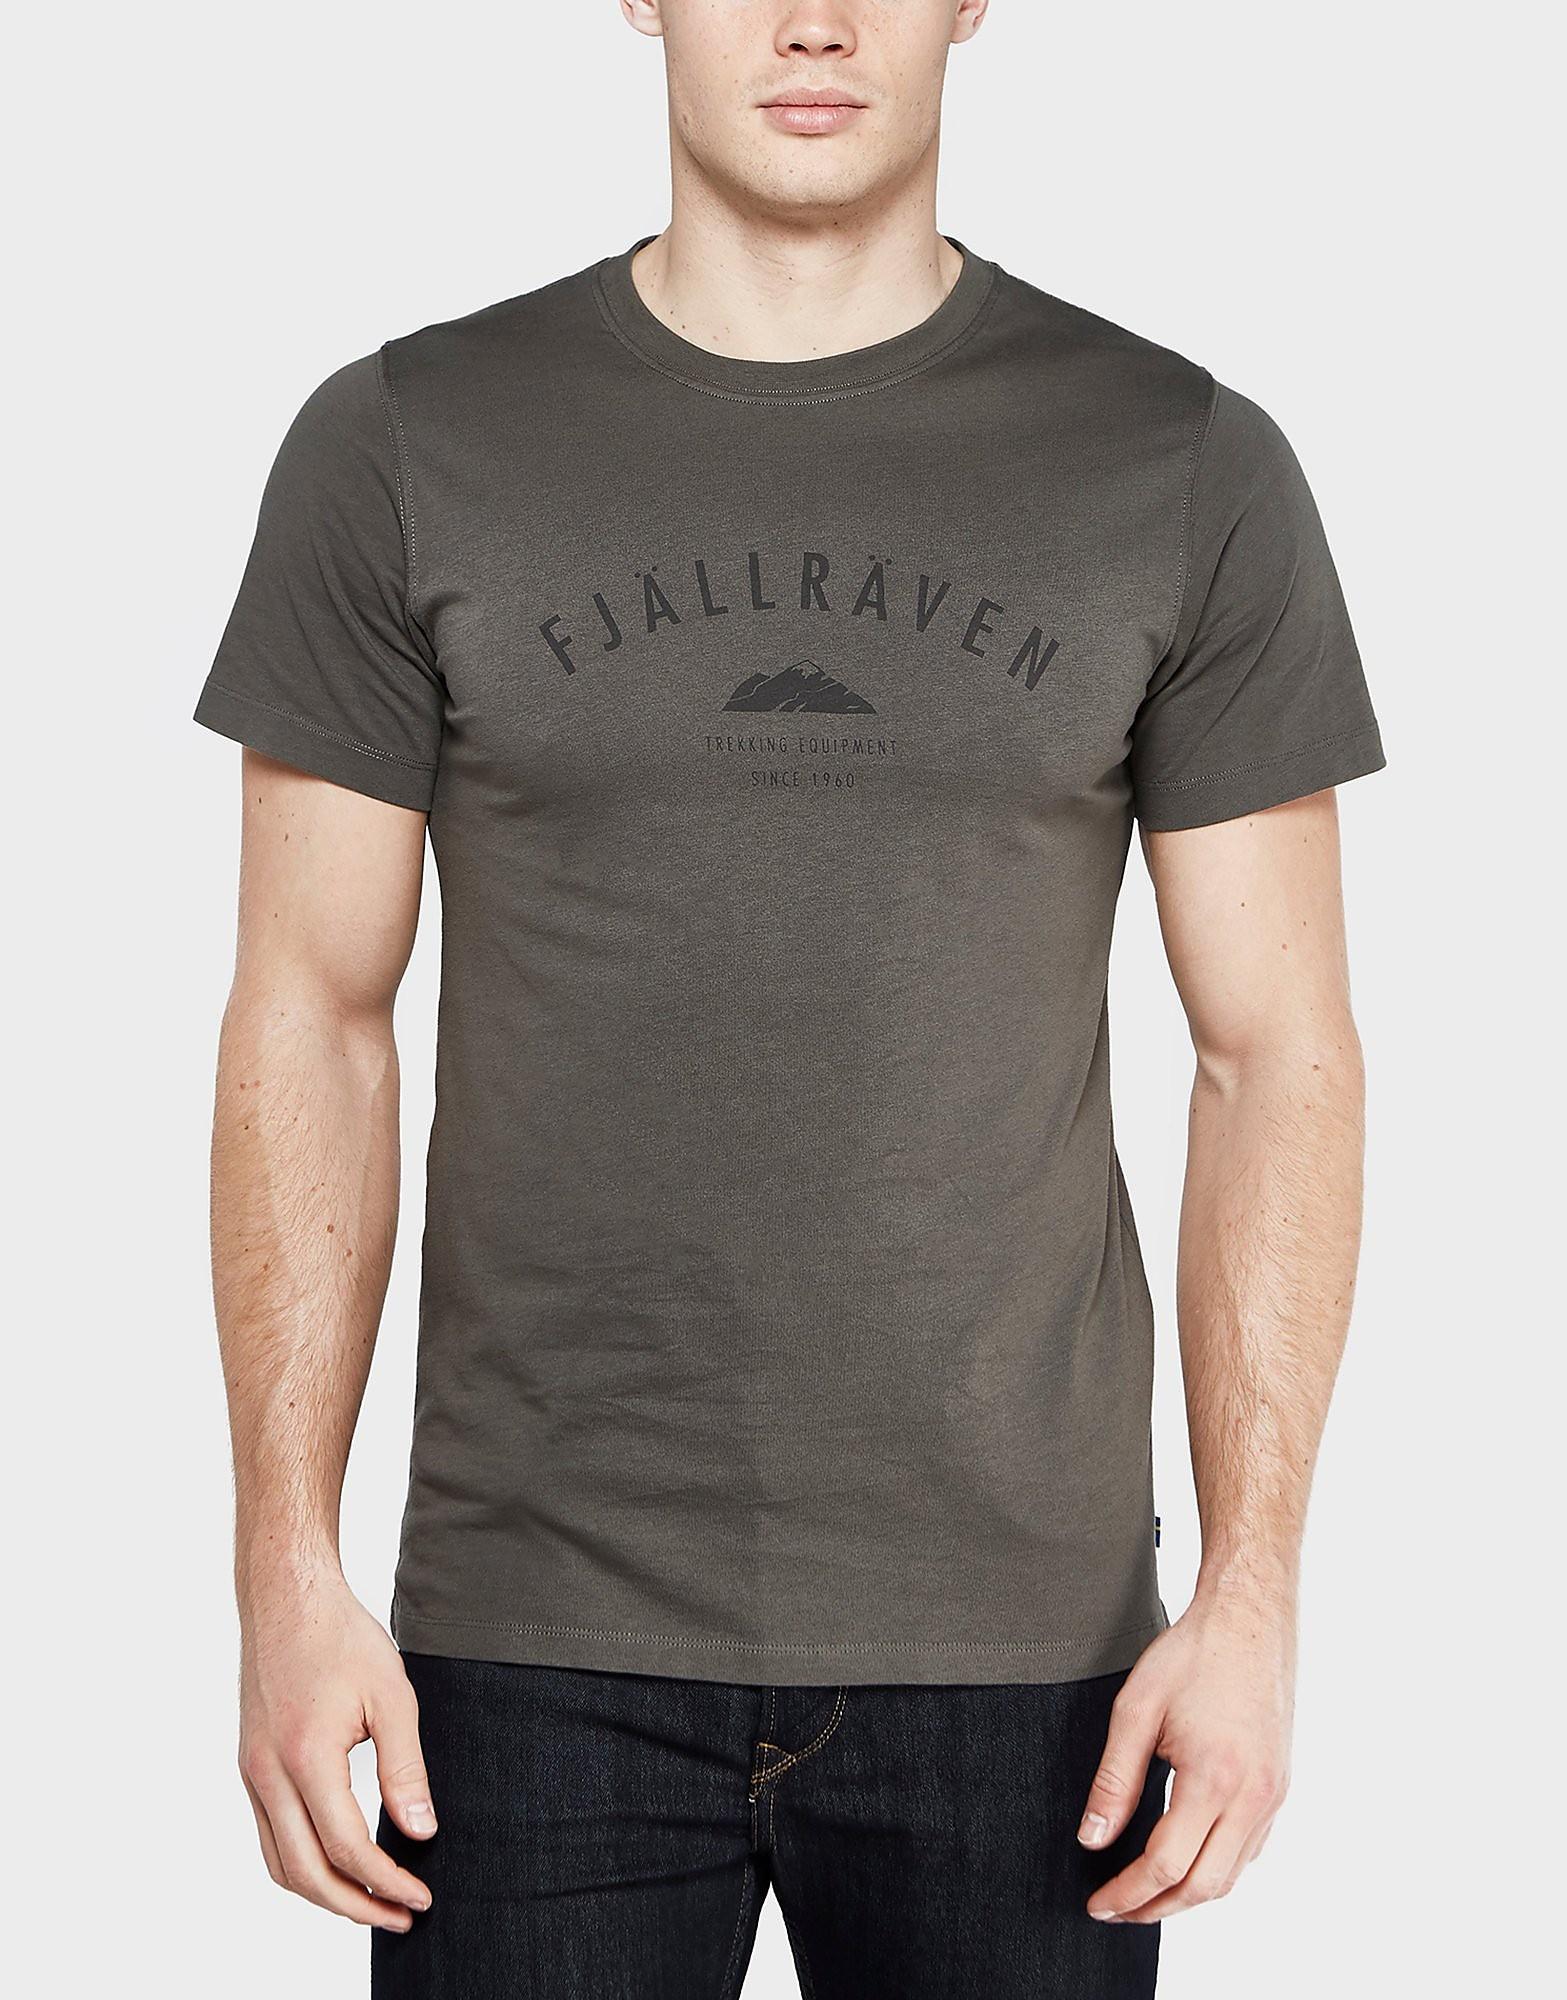 Fjallraven Trekking Logo T-Shirt